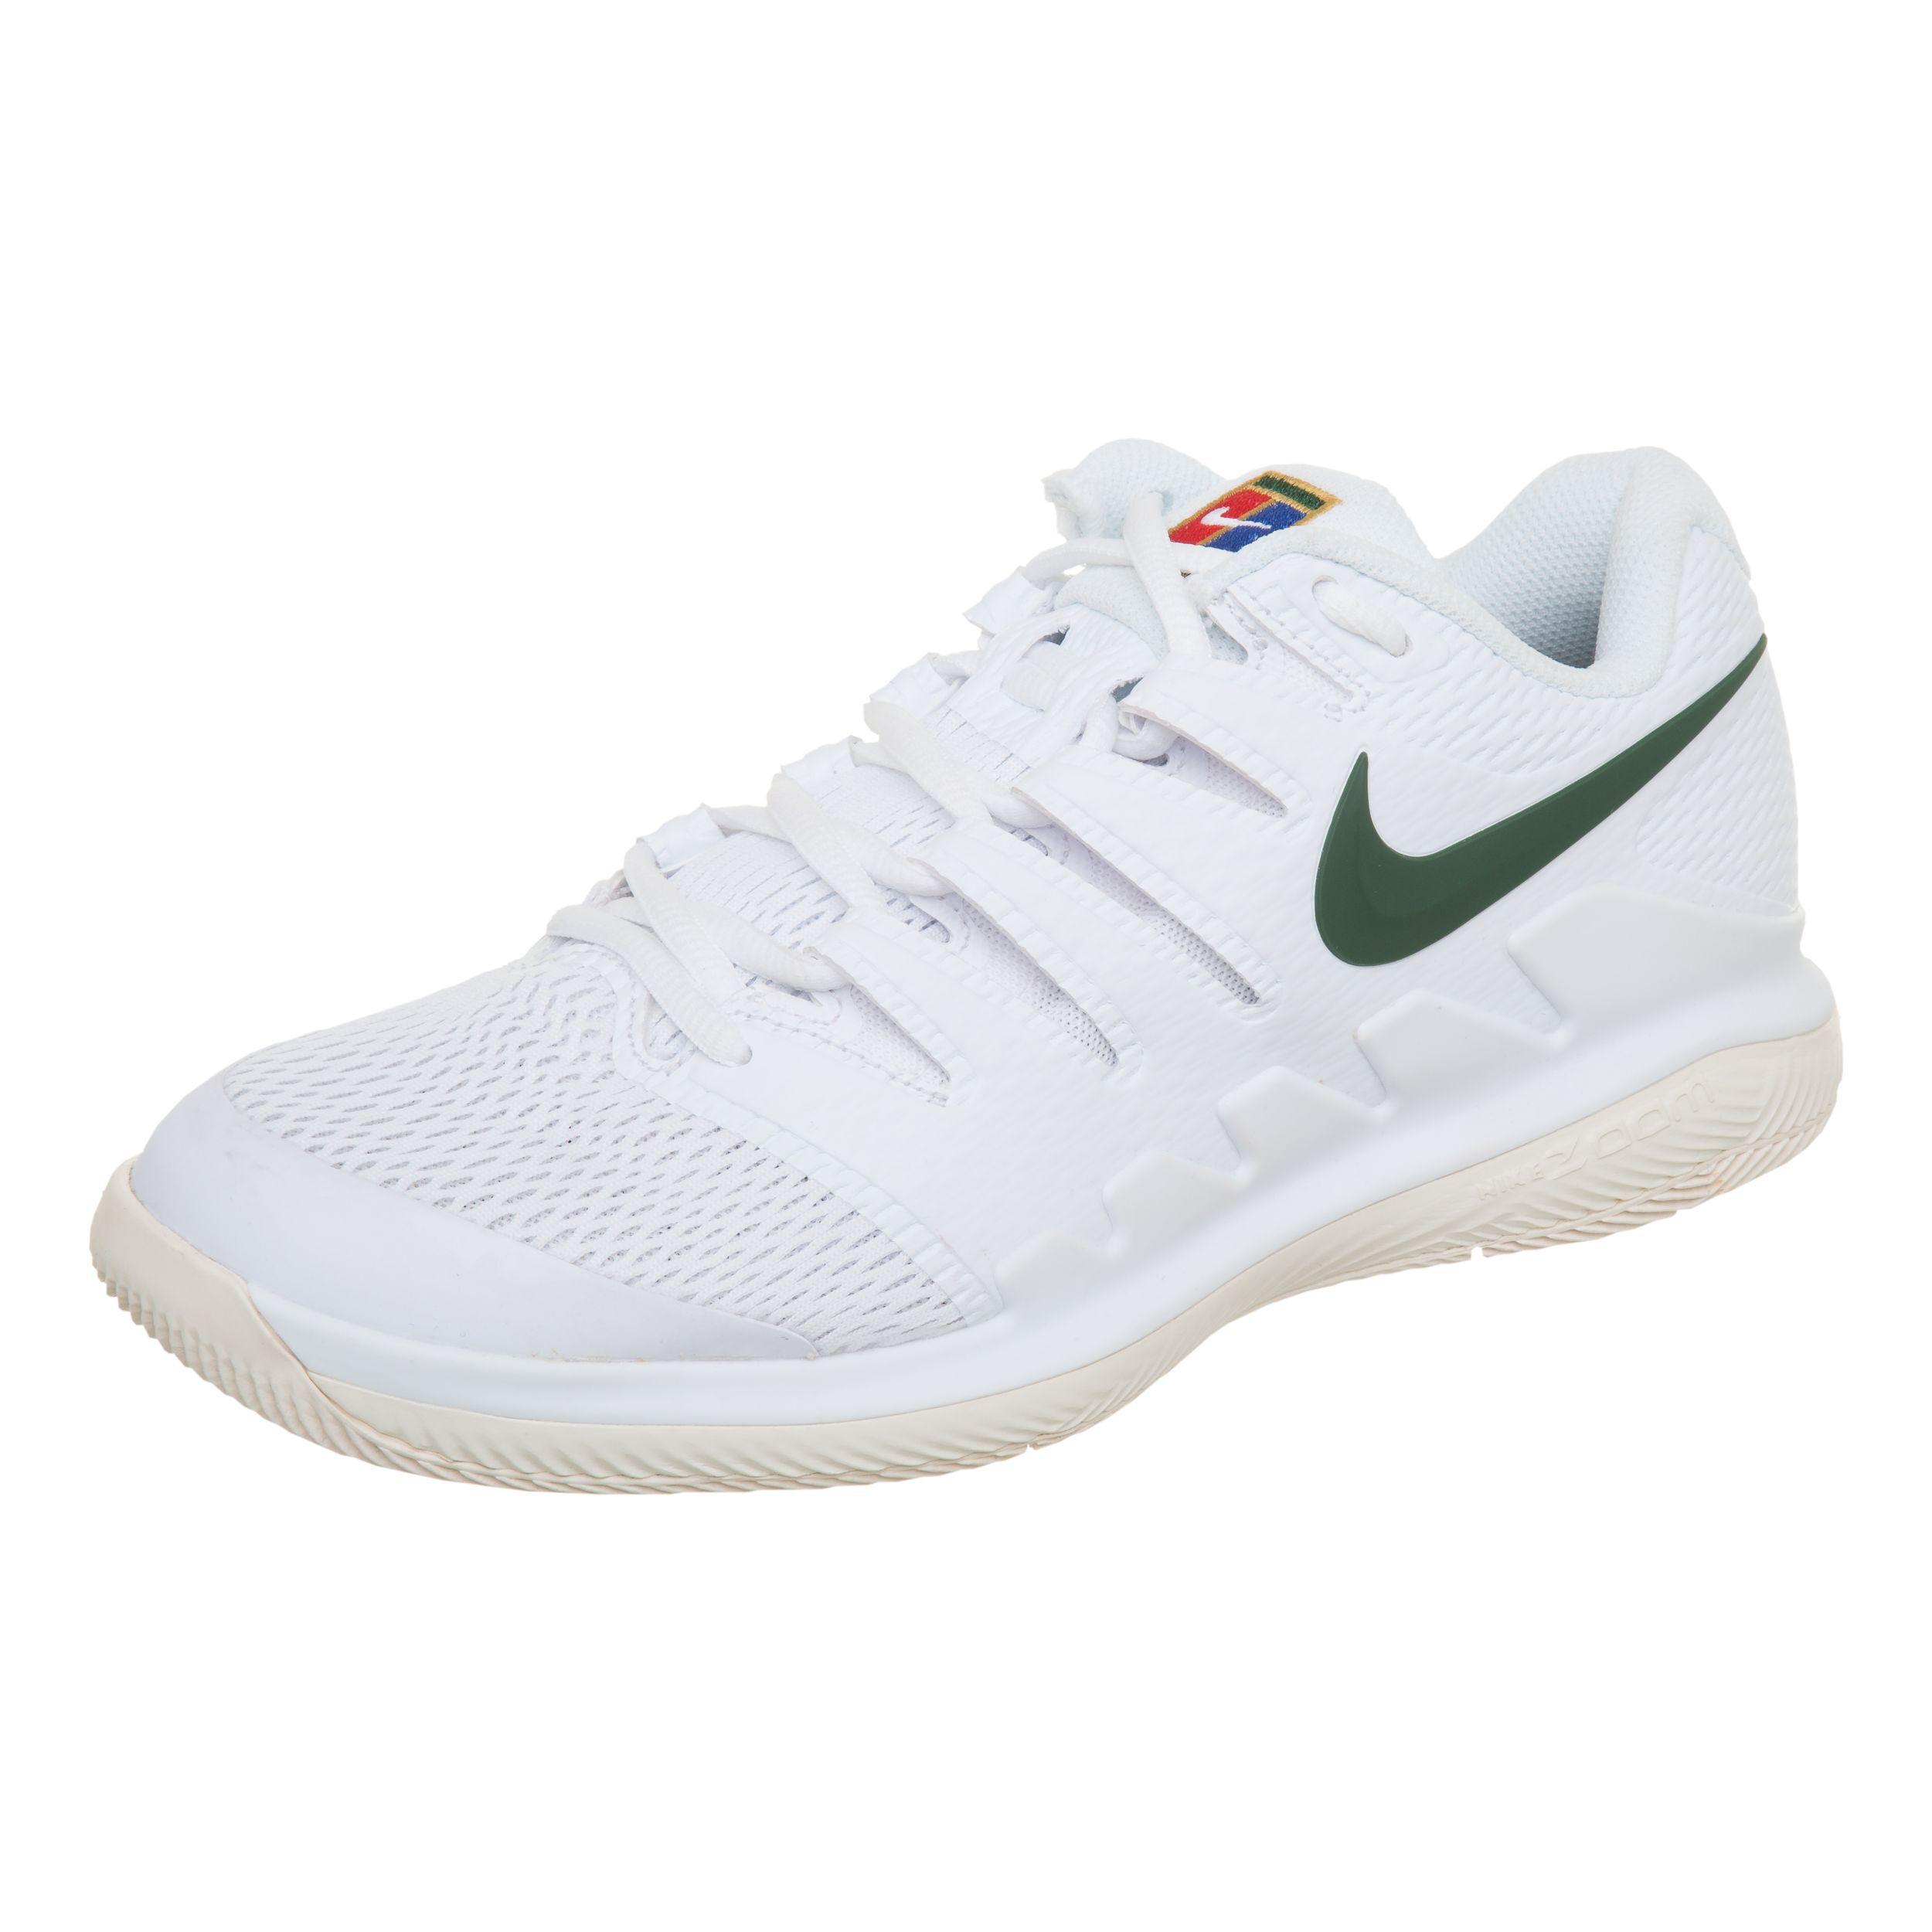 All court Schoenen online kopen | Tennis Point